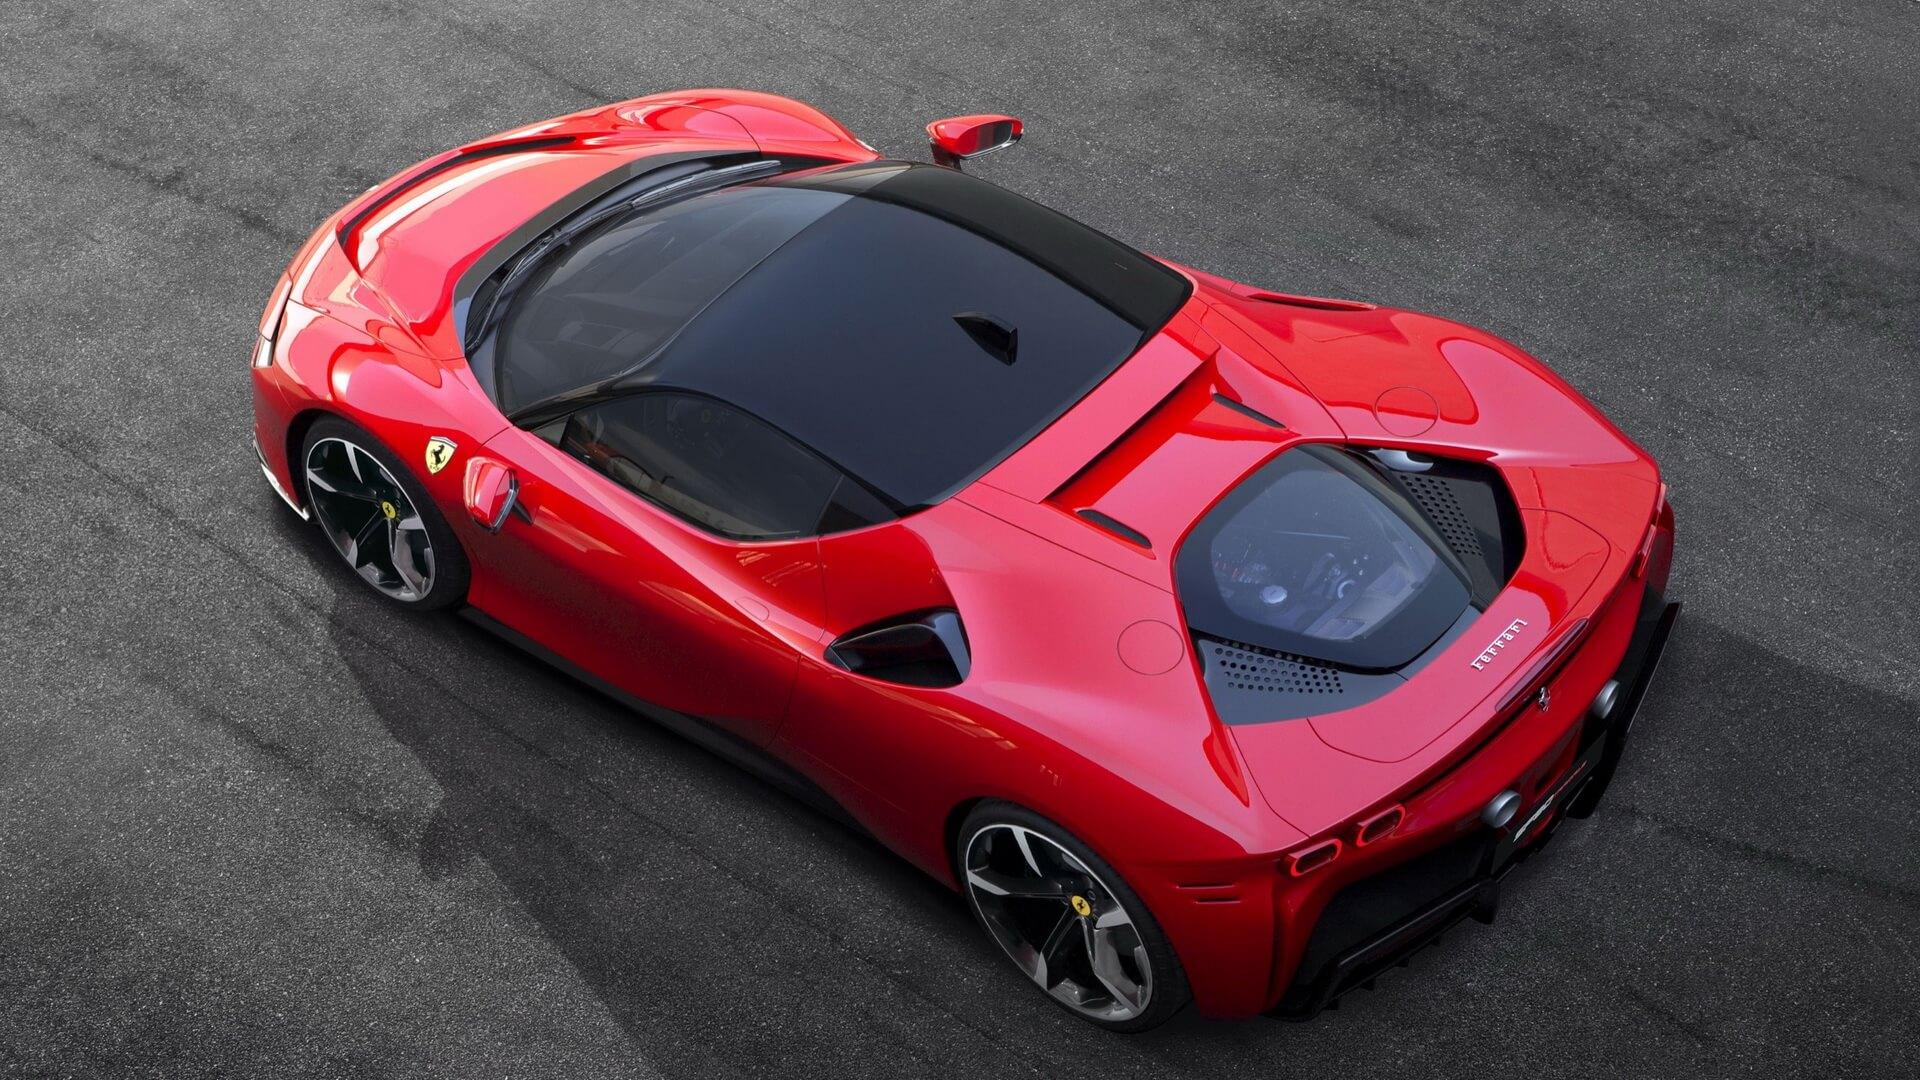 Ferrari SF90 Stradale: плагин-гибридный суперкар с 4 двигателями